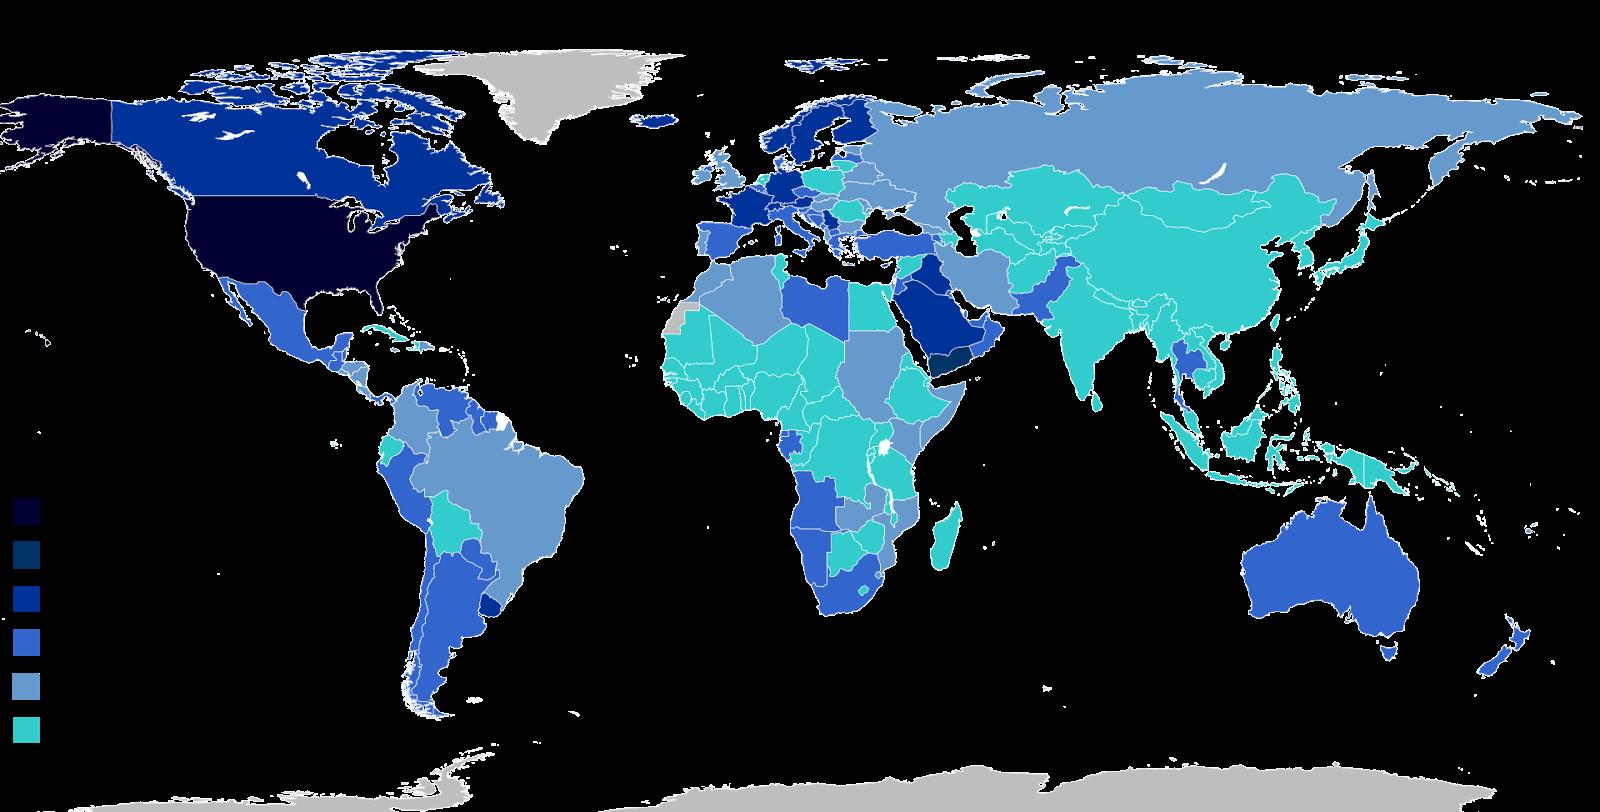 Civilian guns per capita